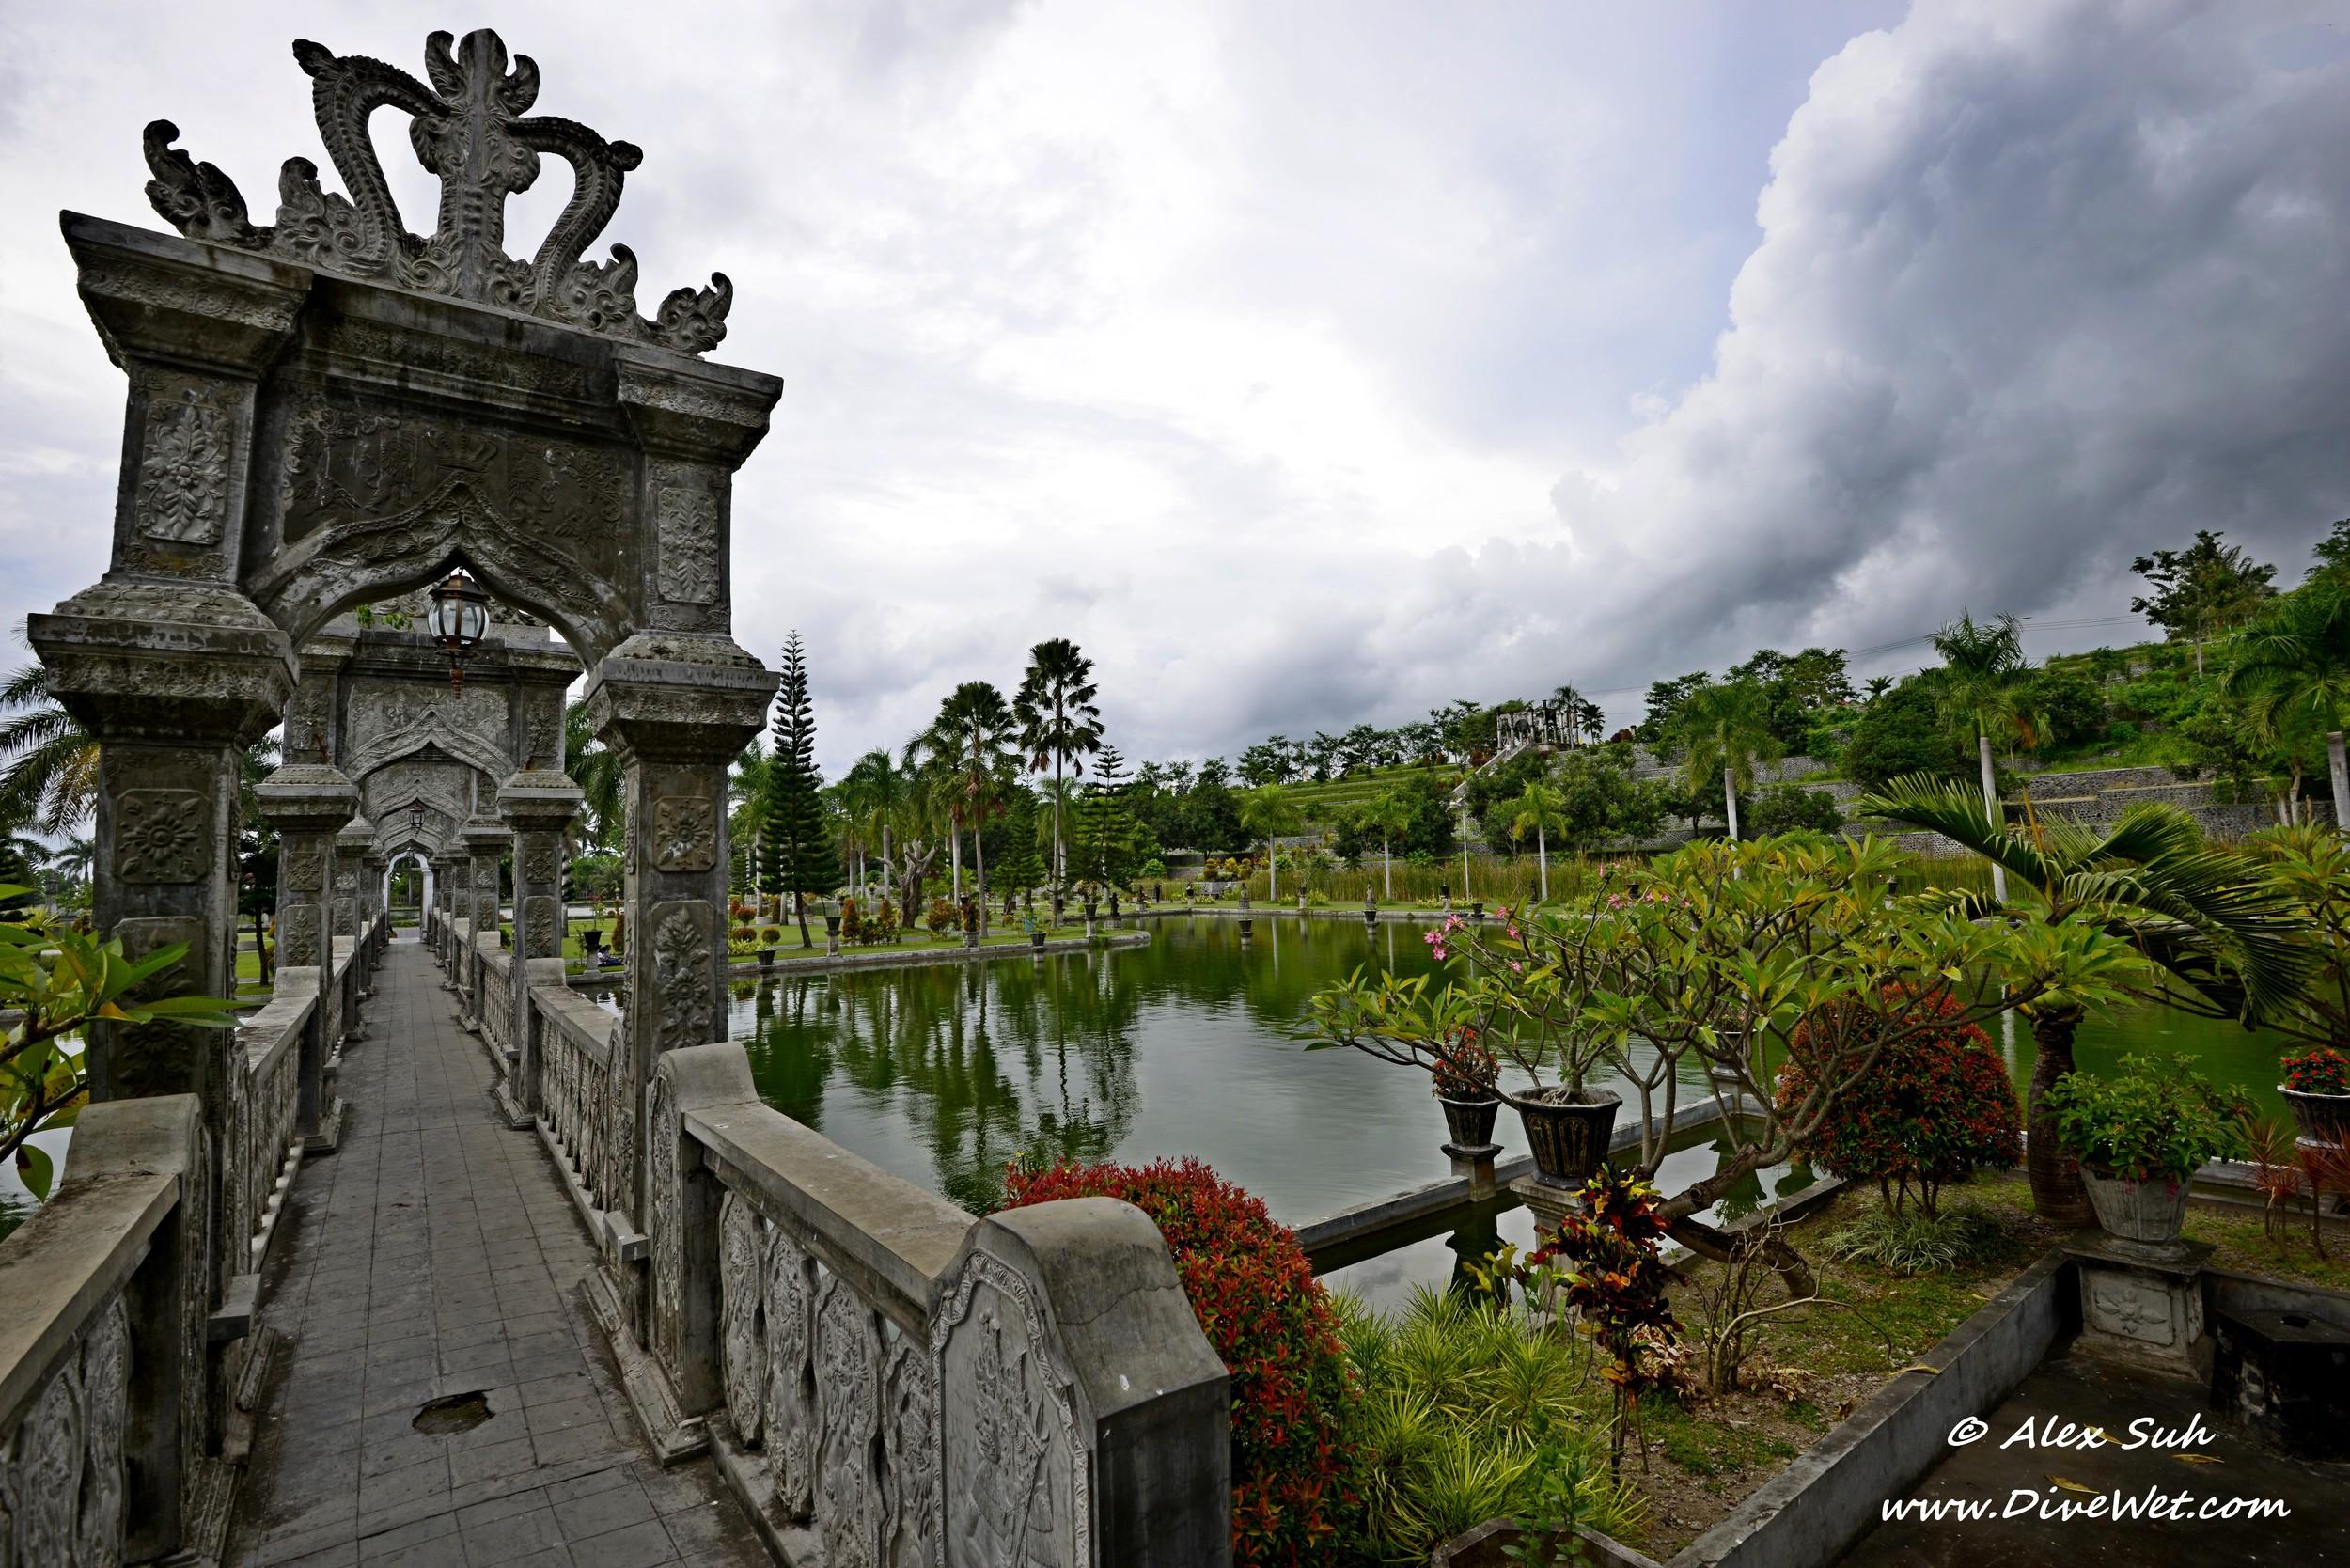 Bali Water Palace Bridge Garden Wide.jpg